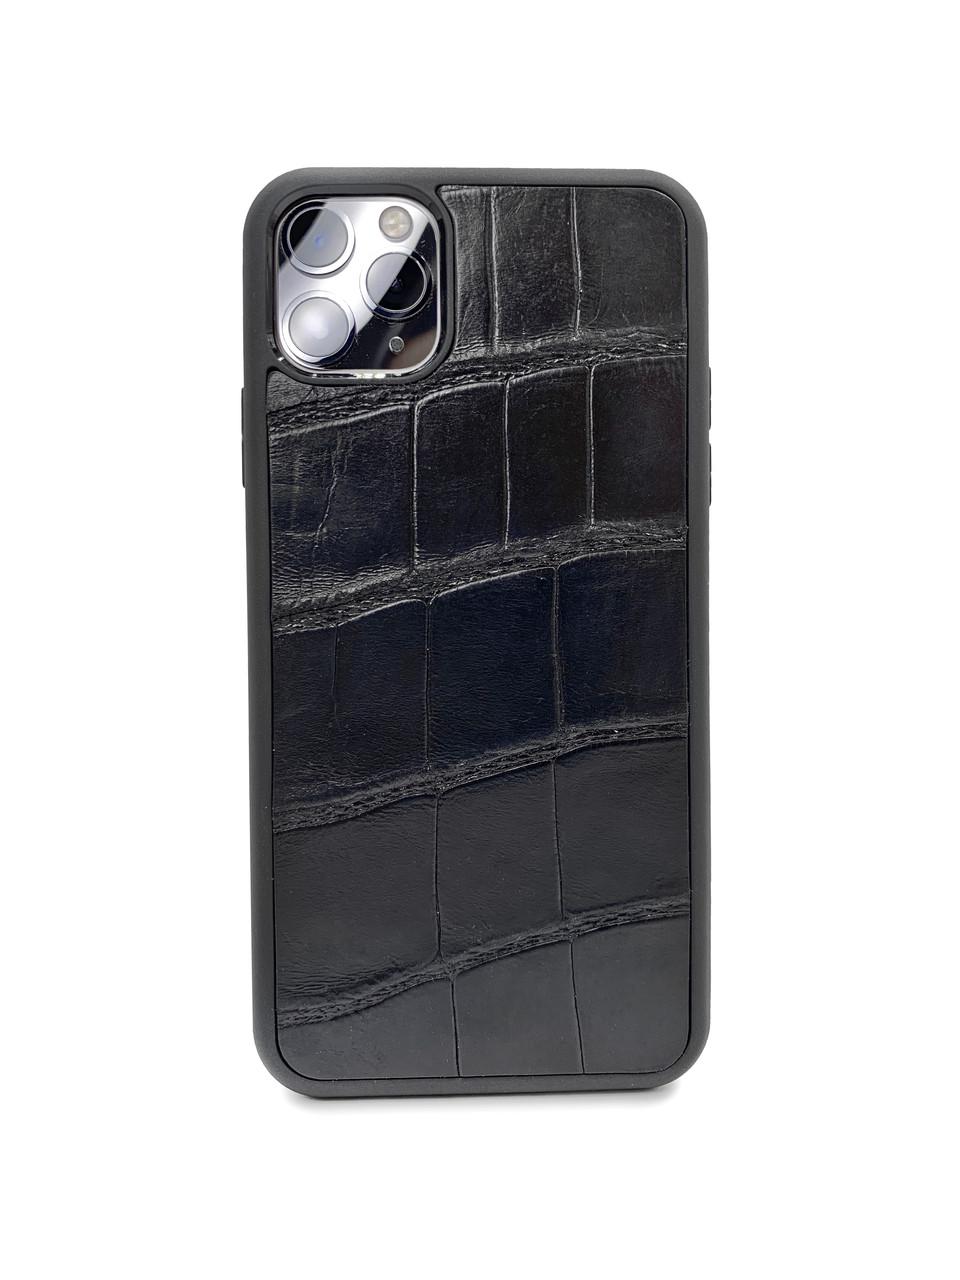 Чехол для iPhone 12 Pro Max чёрного цвета из кожи Крокодила